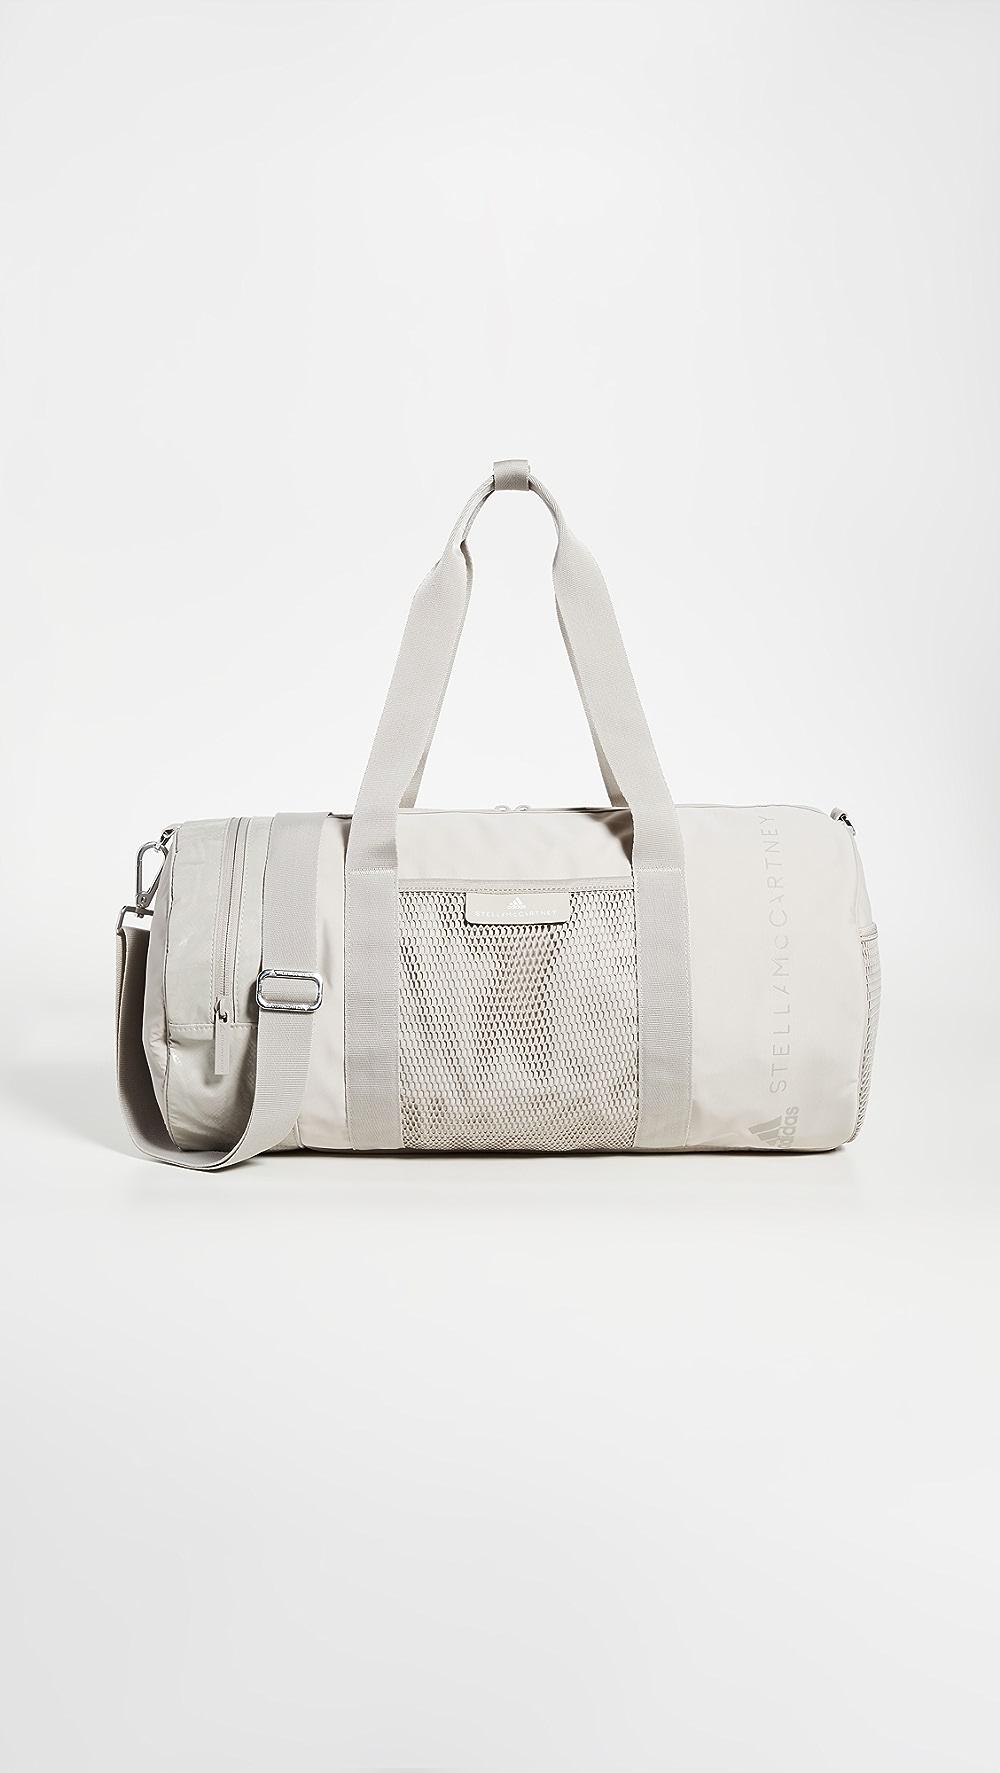 Genteel Adidas By Stella Mccartney - Round Duffel Bag Easy To Repair